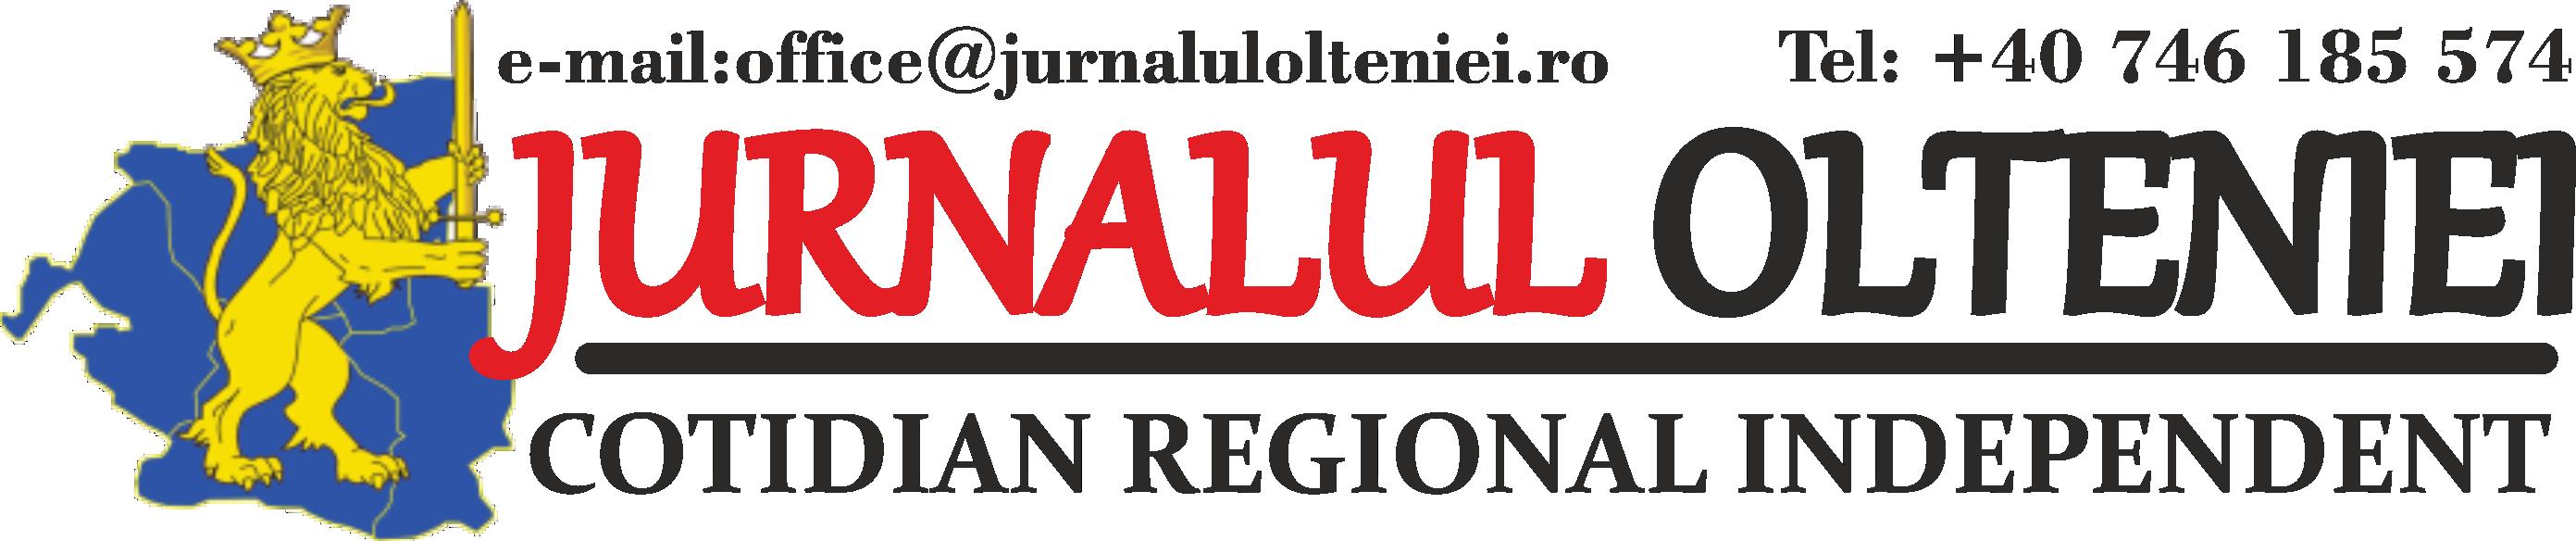 Stiri regionale Oltenia - Jurnalul Olteniei